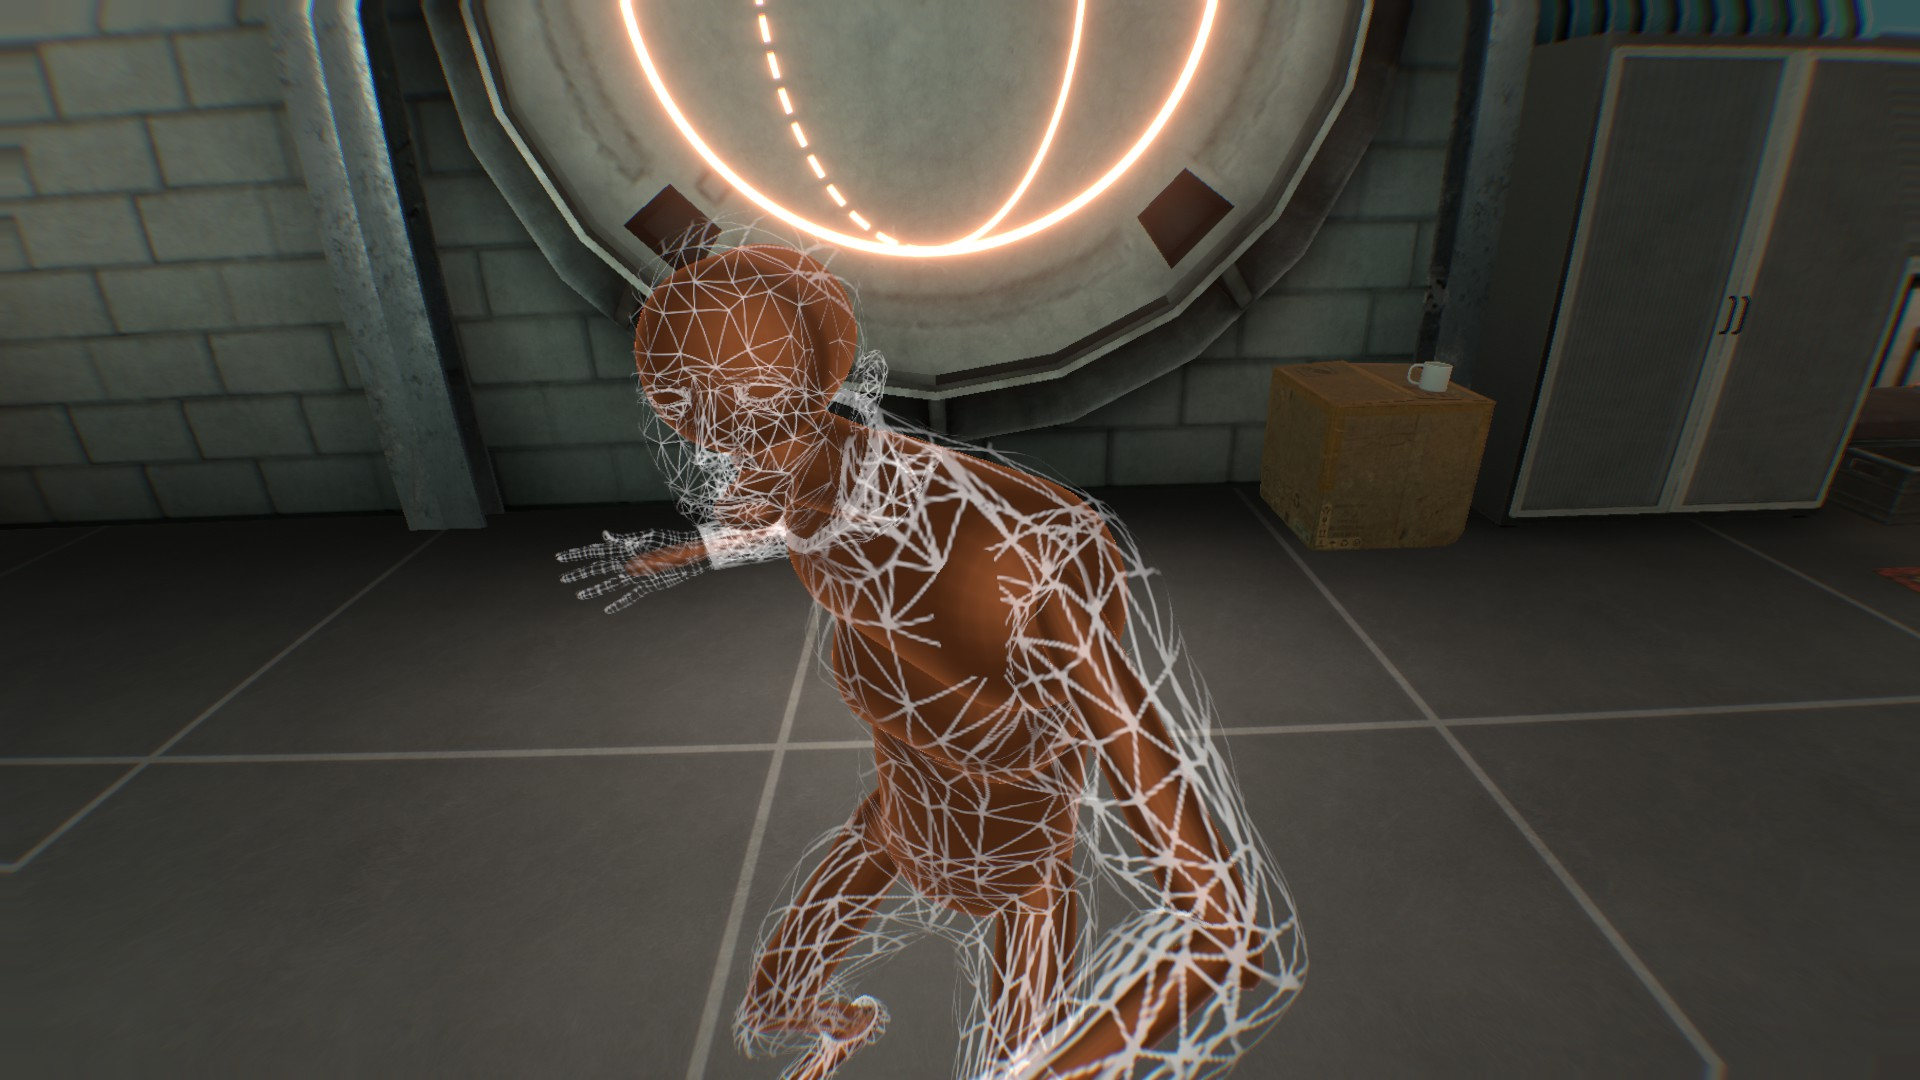 BONEWORKS - Gameplay Tips for New Players + Walkthrough - Enemies - 4E79685